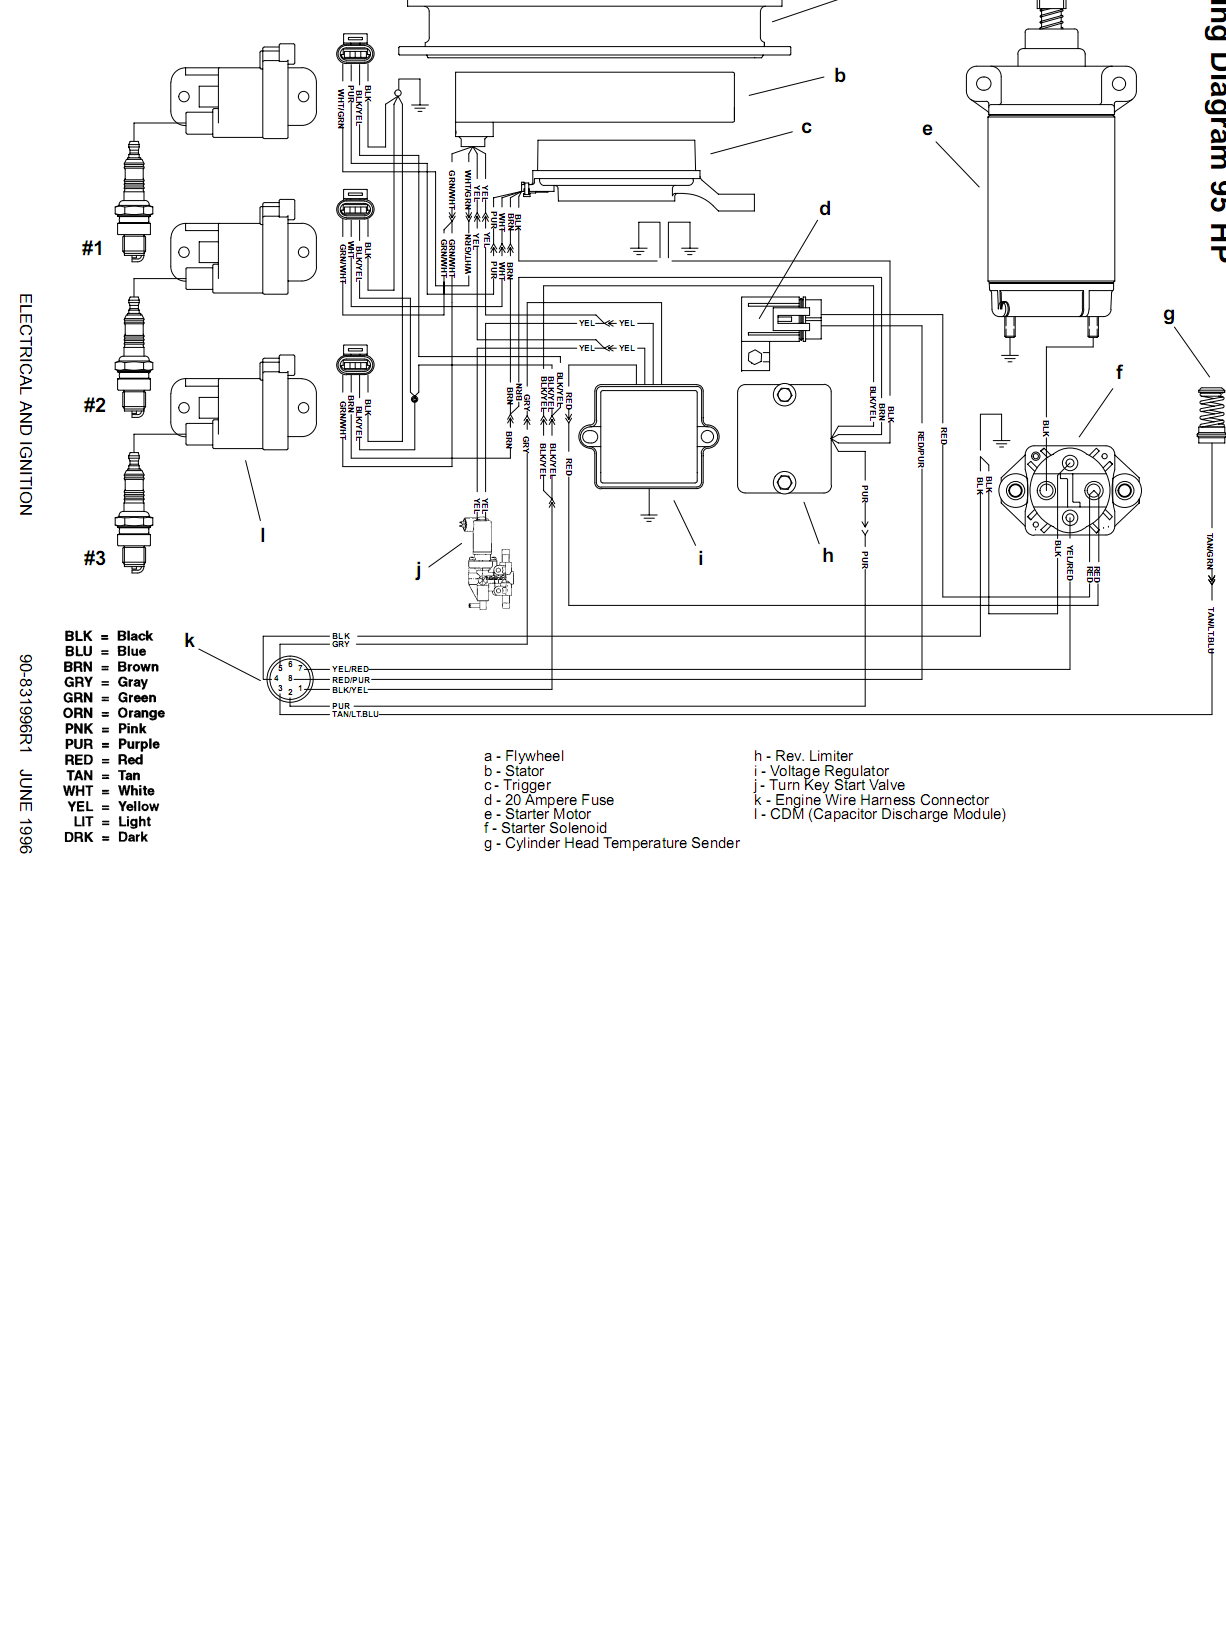 Wiring Diagram For 1994 Sundancer